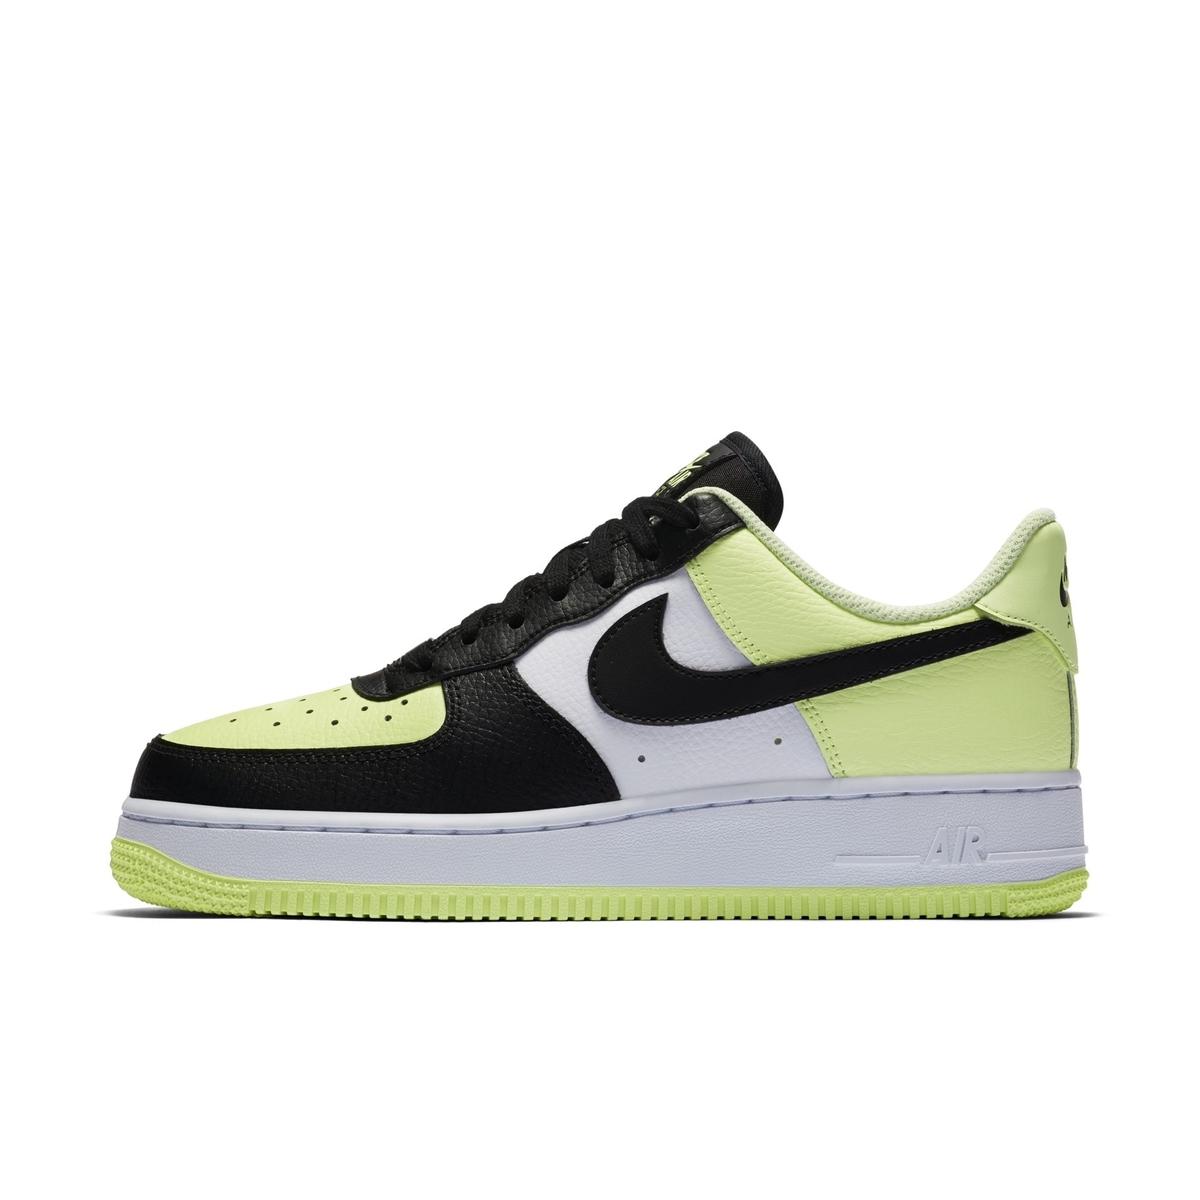 Nike,Air Force 1 Low,WMNS  亮眼苹果绿色!这双全新配色 Air Force 1 你打几分?